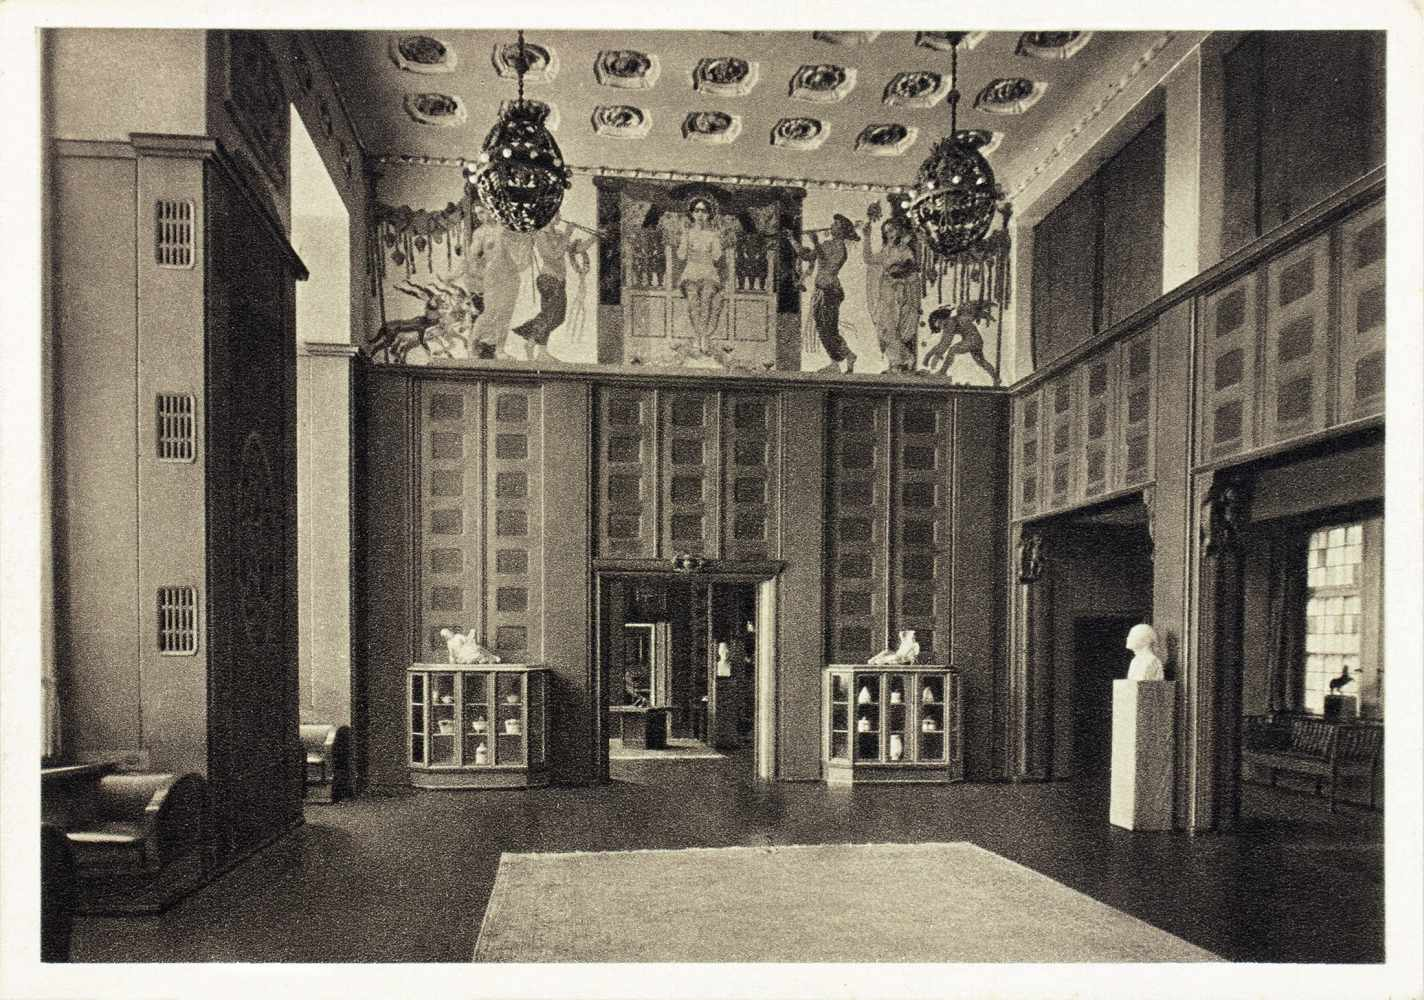 Kurt Schwitters - H. Bahlsens Keks-Farbik Hannover. Drei Werbepostkarten. Um 1929. 10,5 : 14,8 cm. - Image 3 of 4